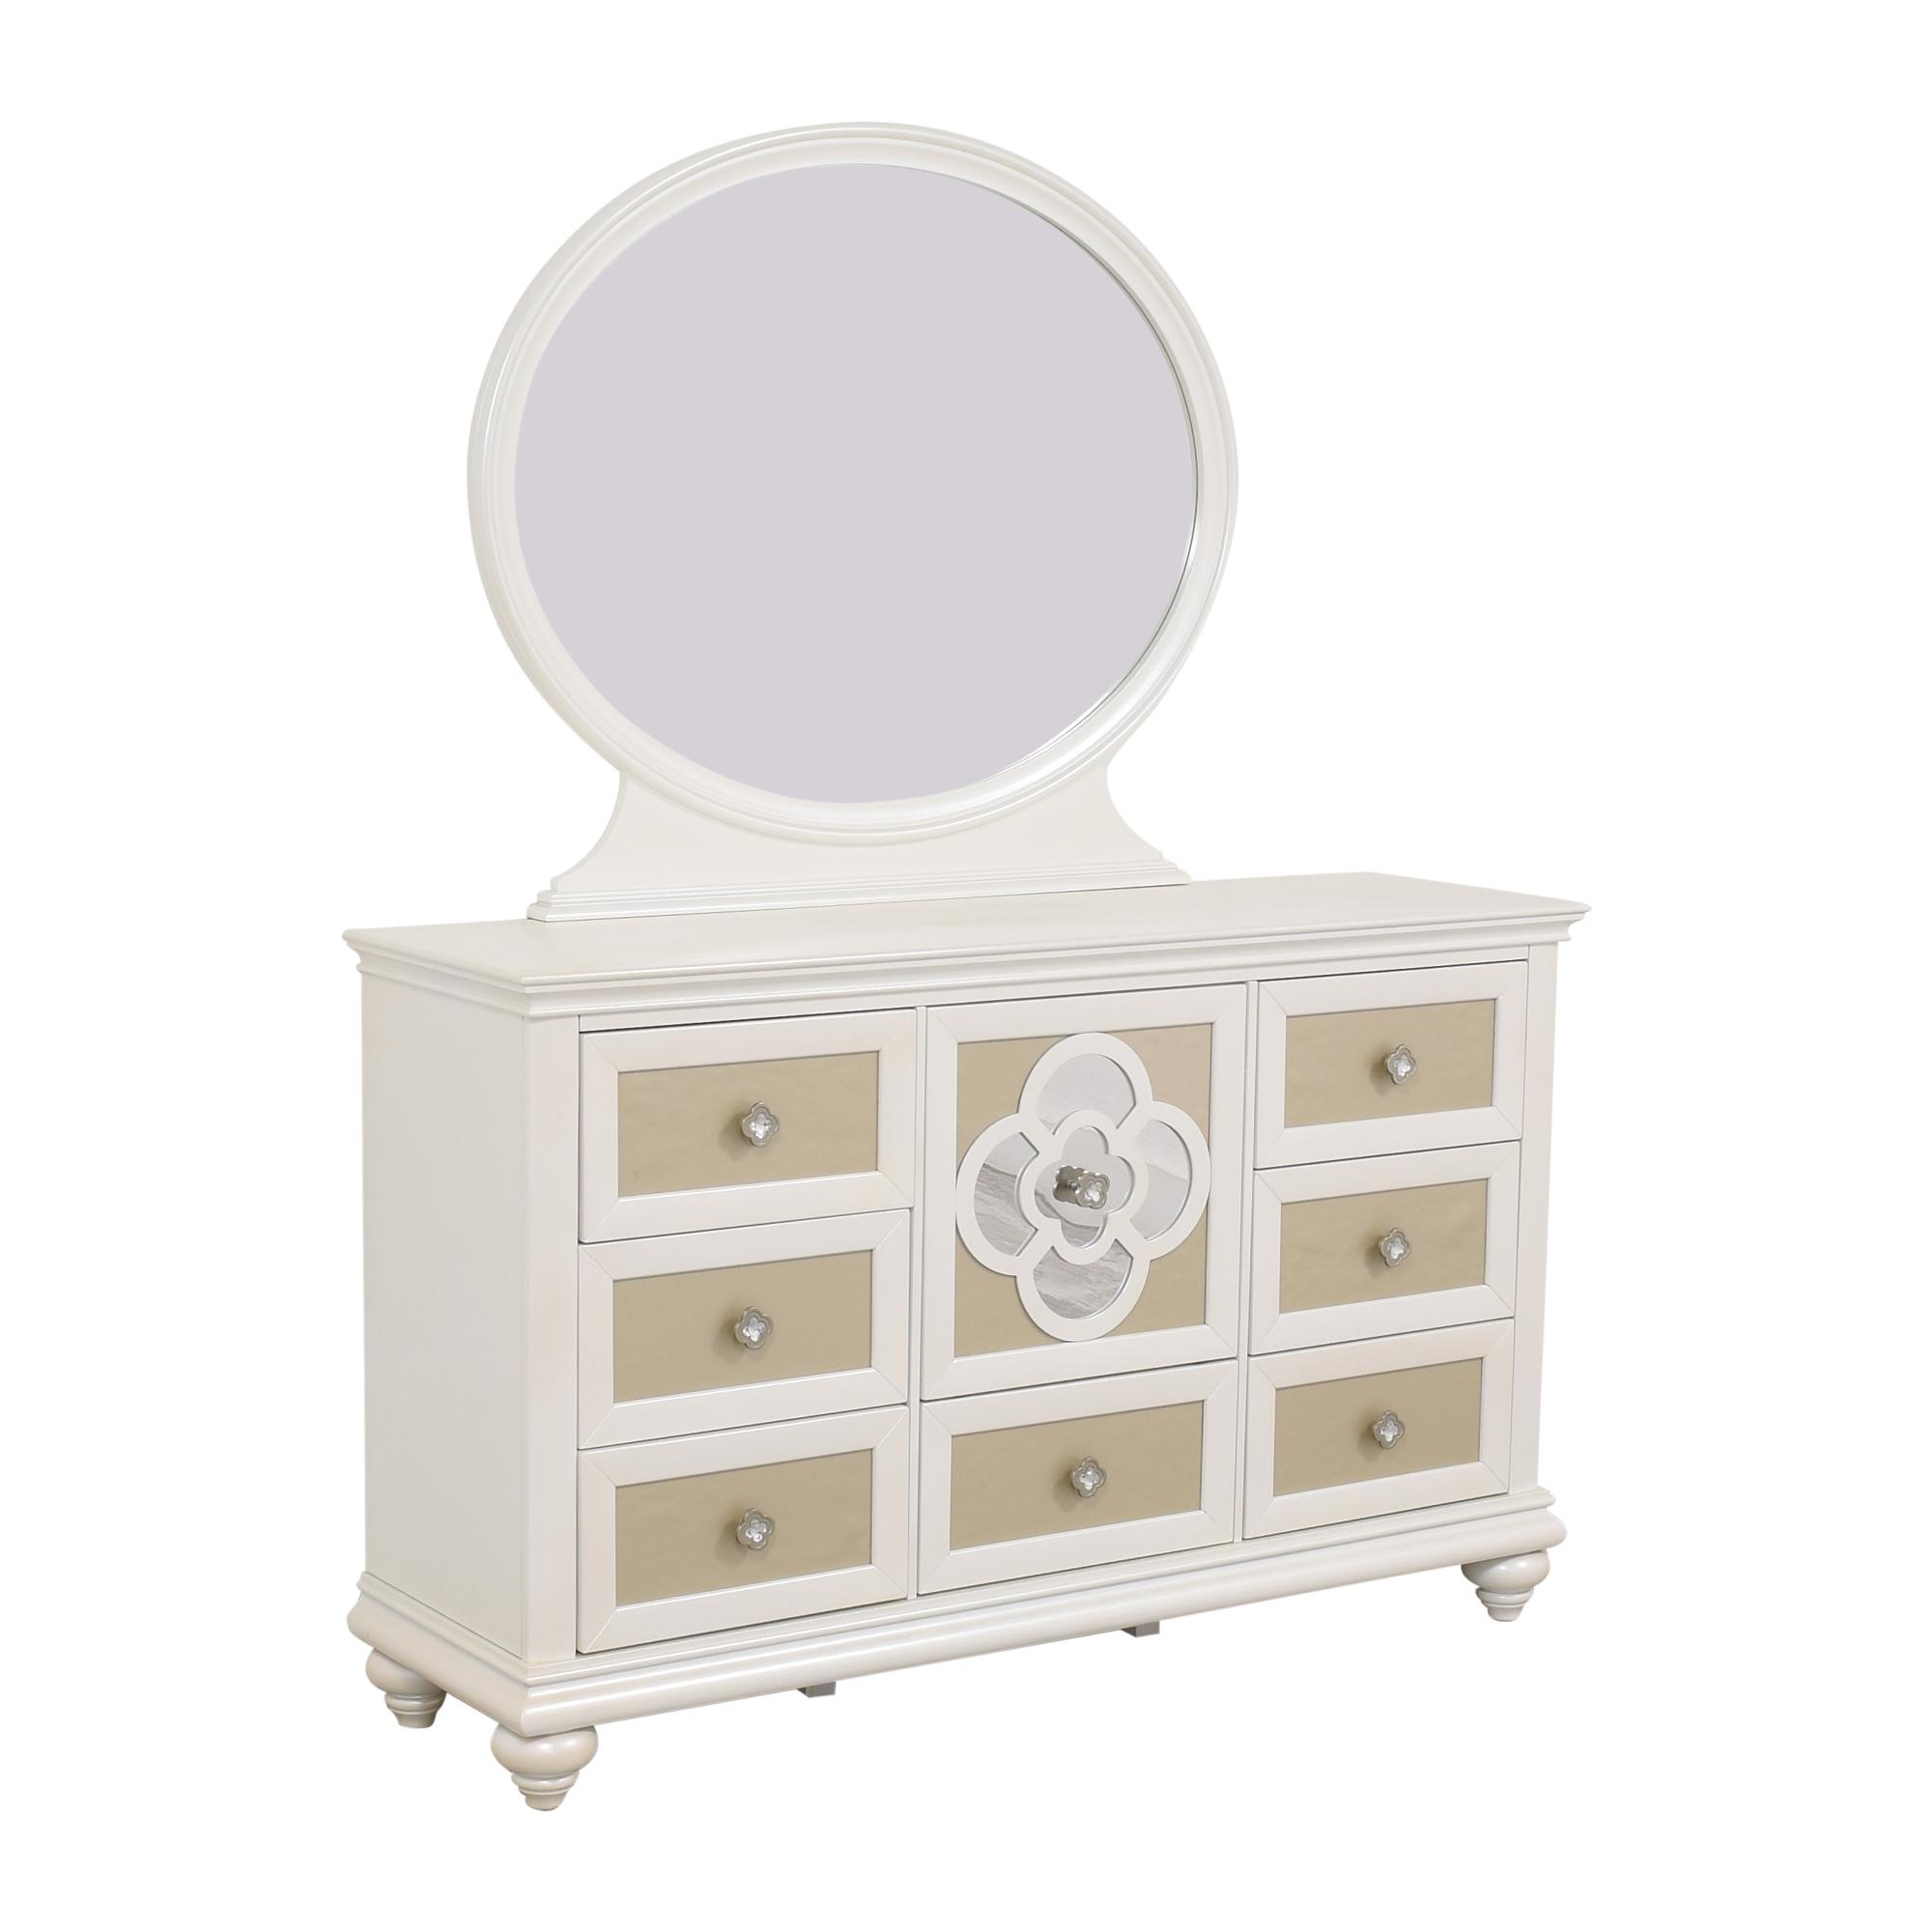 Najarian Furniture Raymour & Flanigan Paris Dresser with Mirror coupon